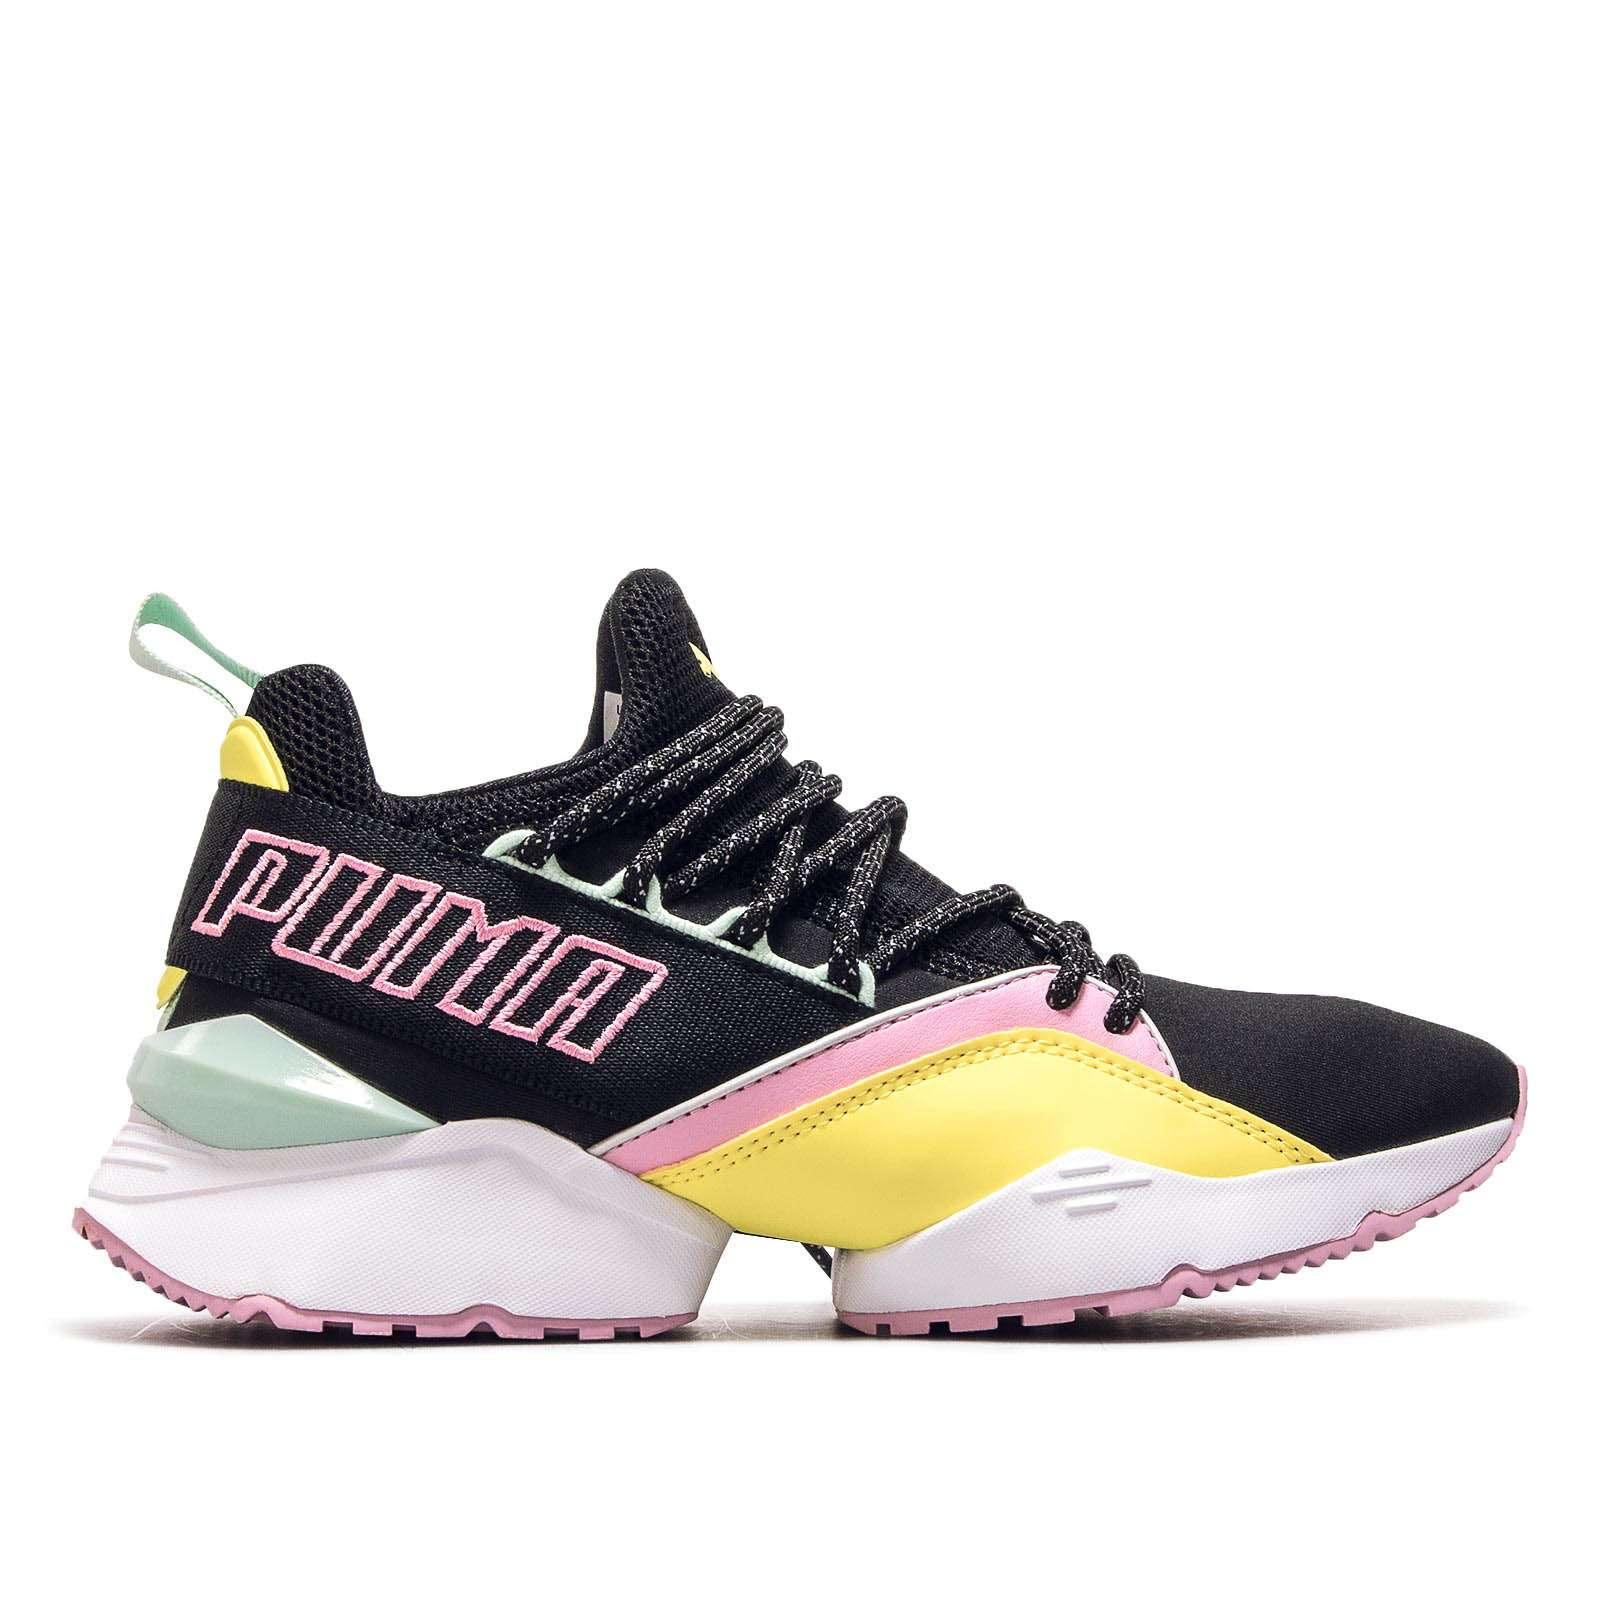 69a796c02e41e1 bunten Damen Sneaker von Puma online kaufen